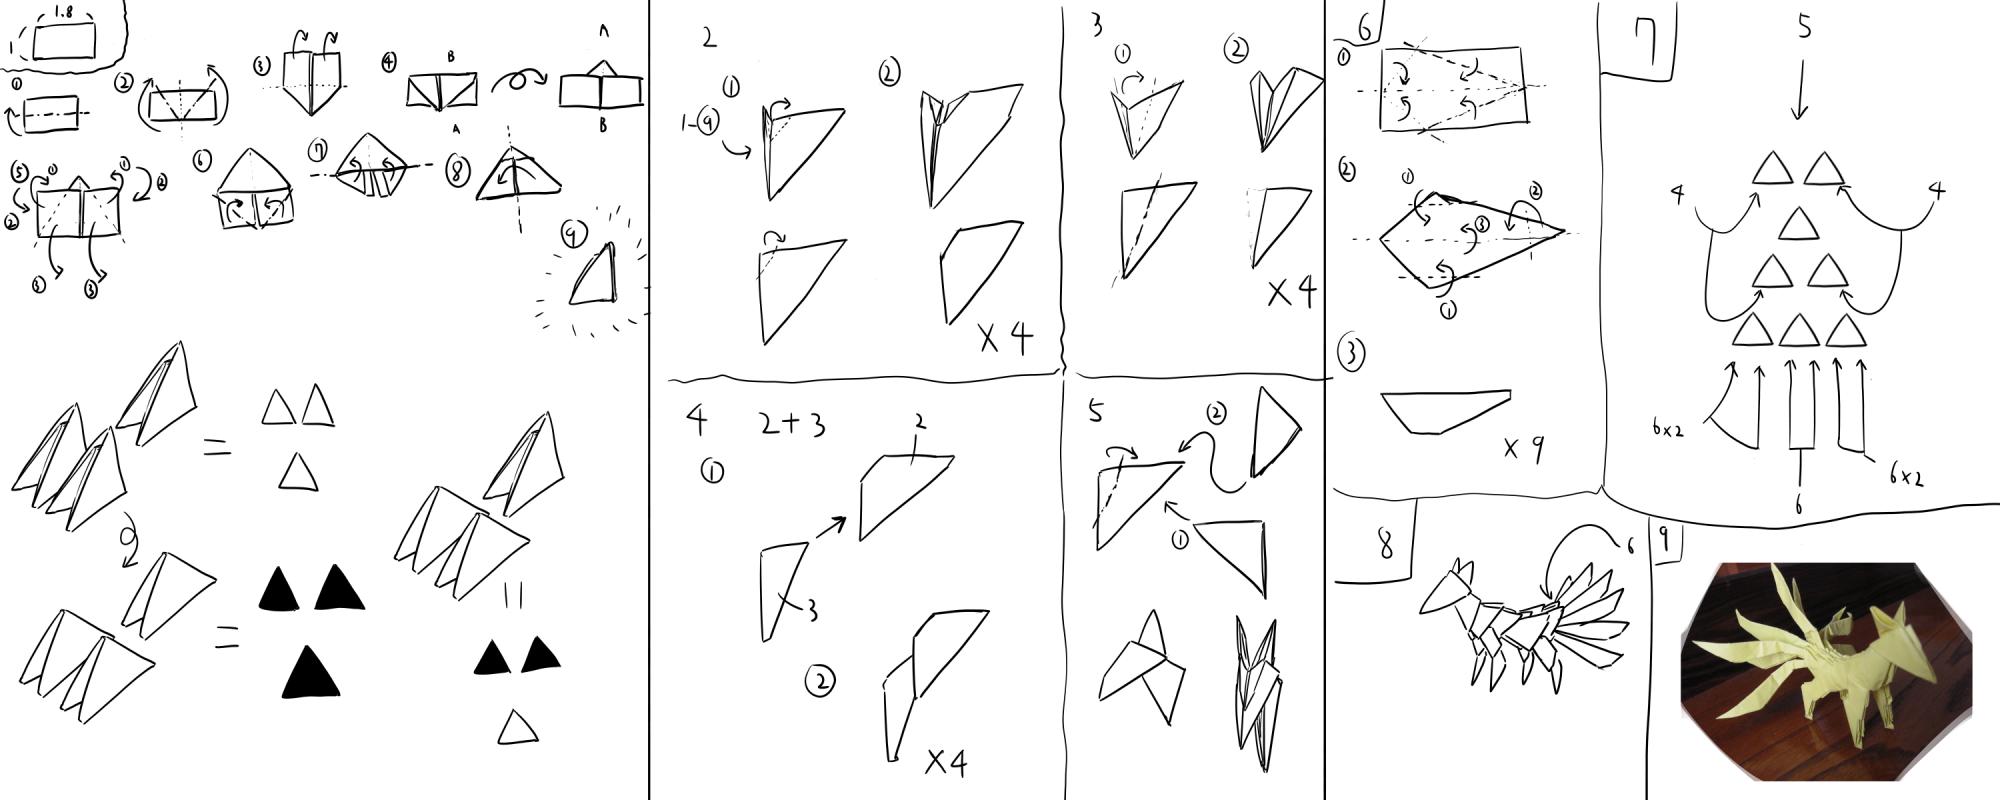 3d origami Nine-tailed fox how to build. by kumazaza on ...